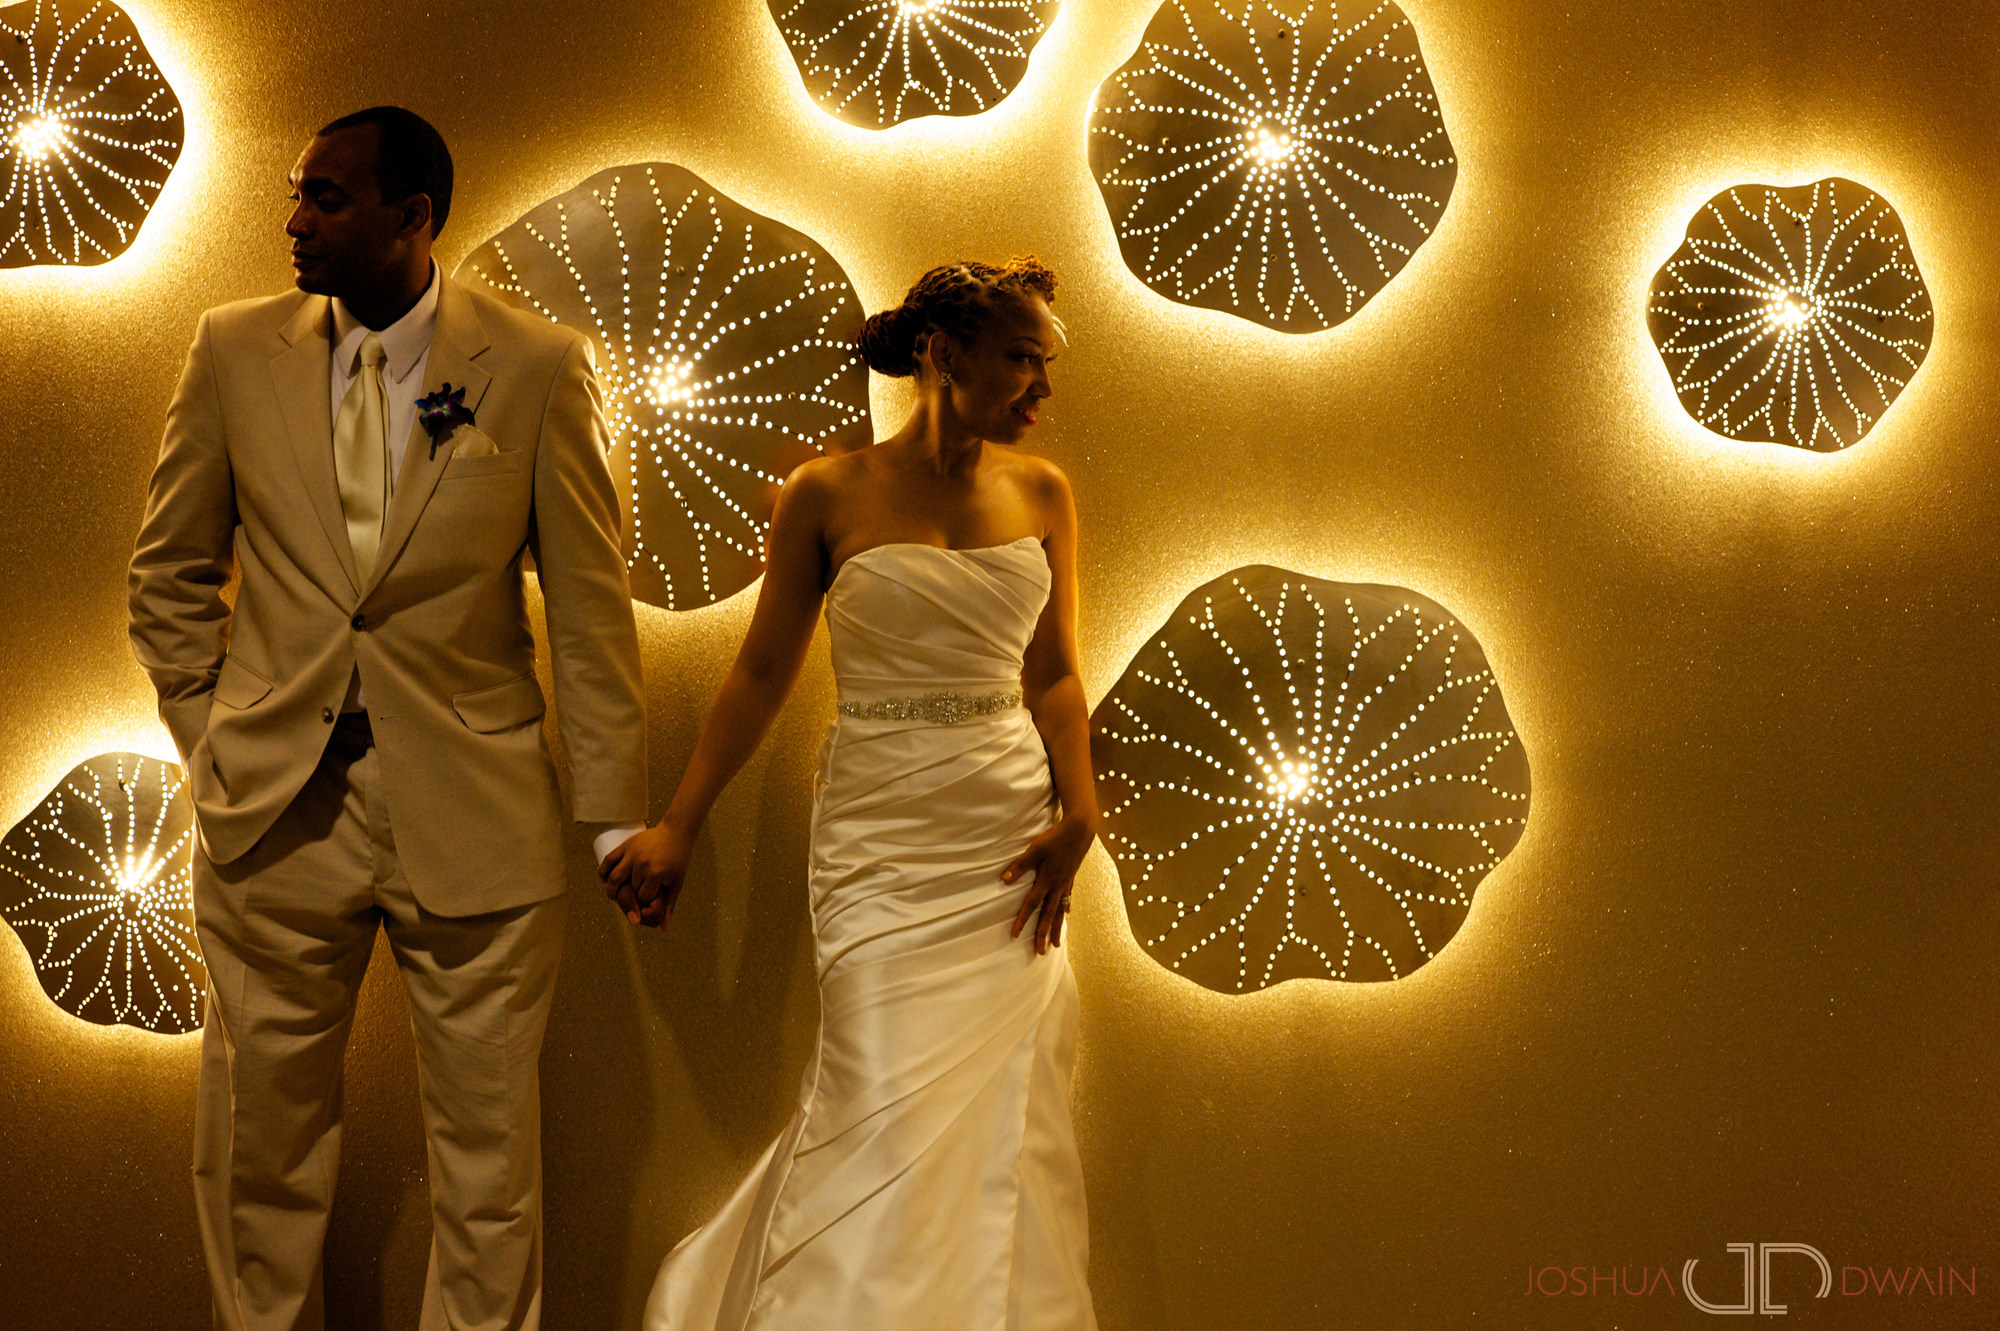 candra-alonza-020-holiday-inn-south-beach-miami-wedding-photographer-joshua-dwain-2012-07-28_ca_490